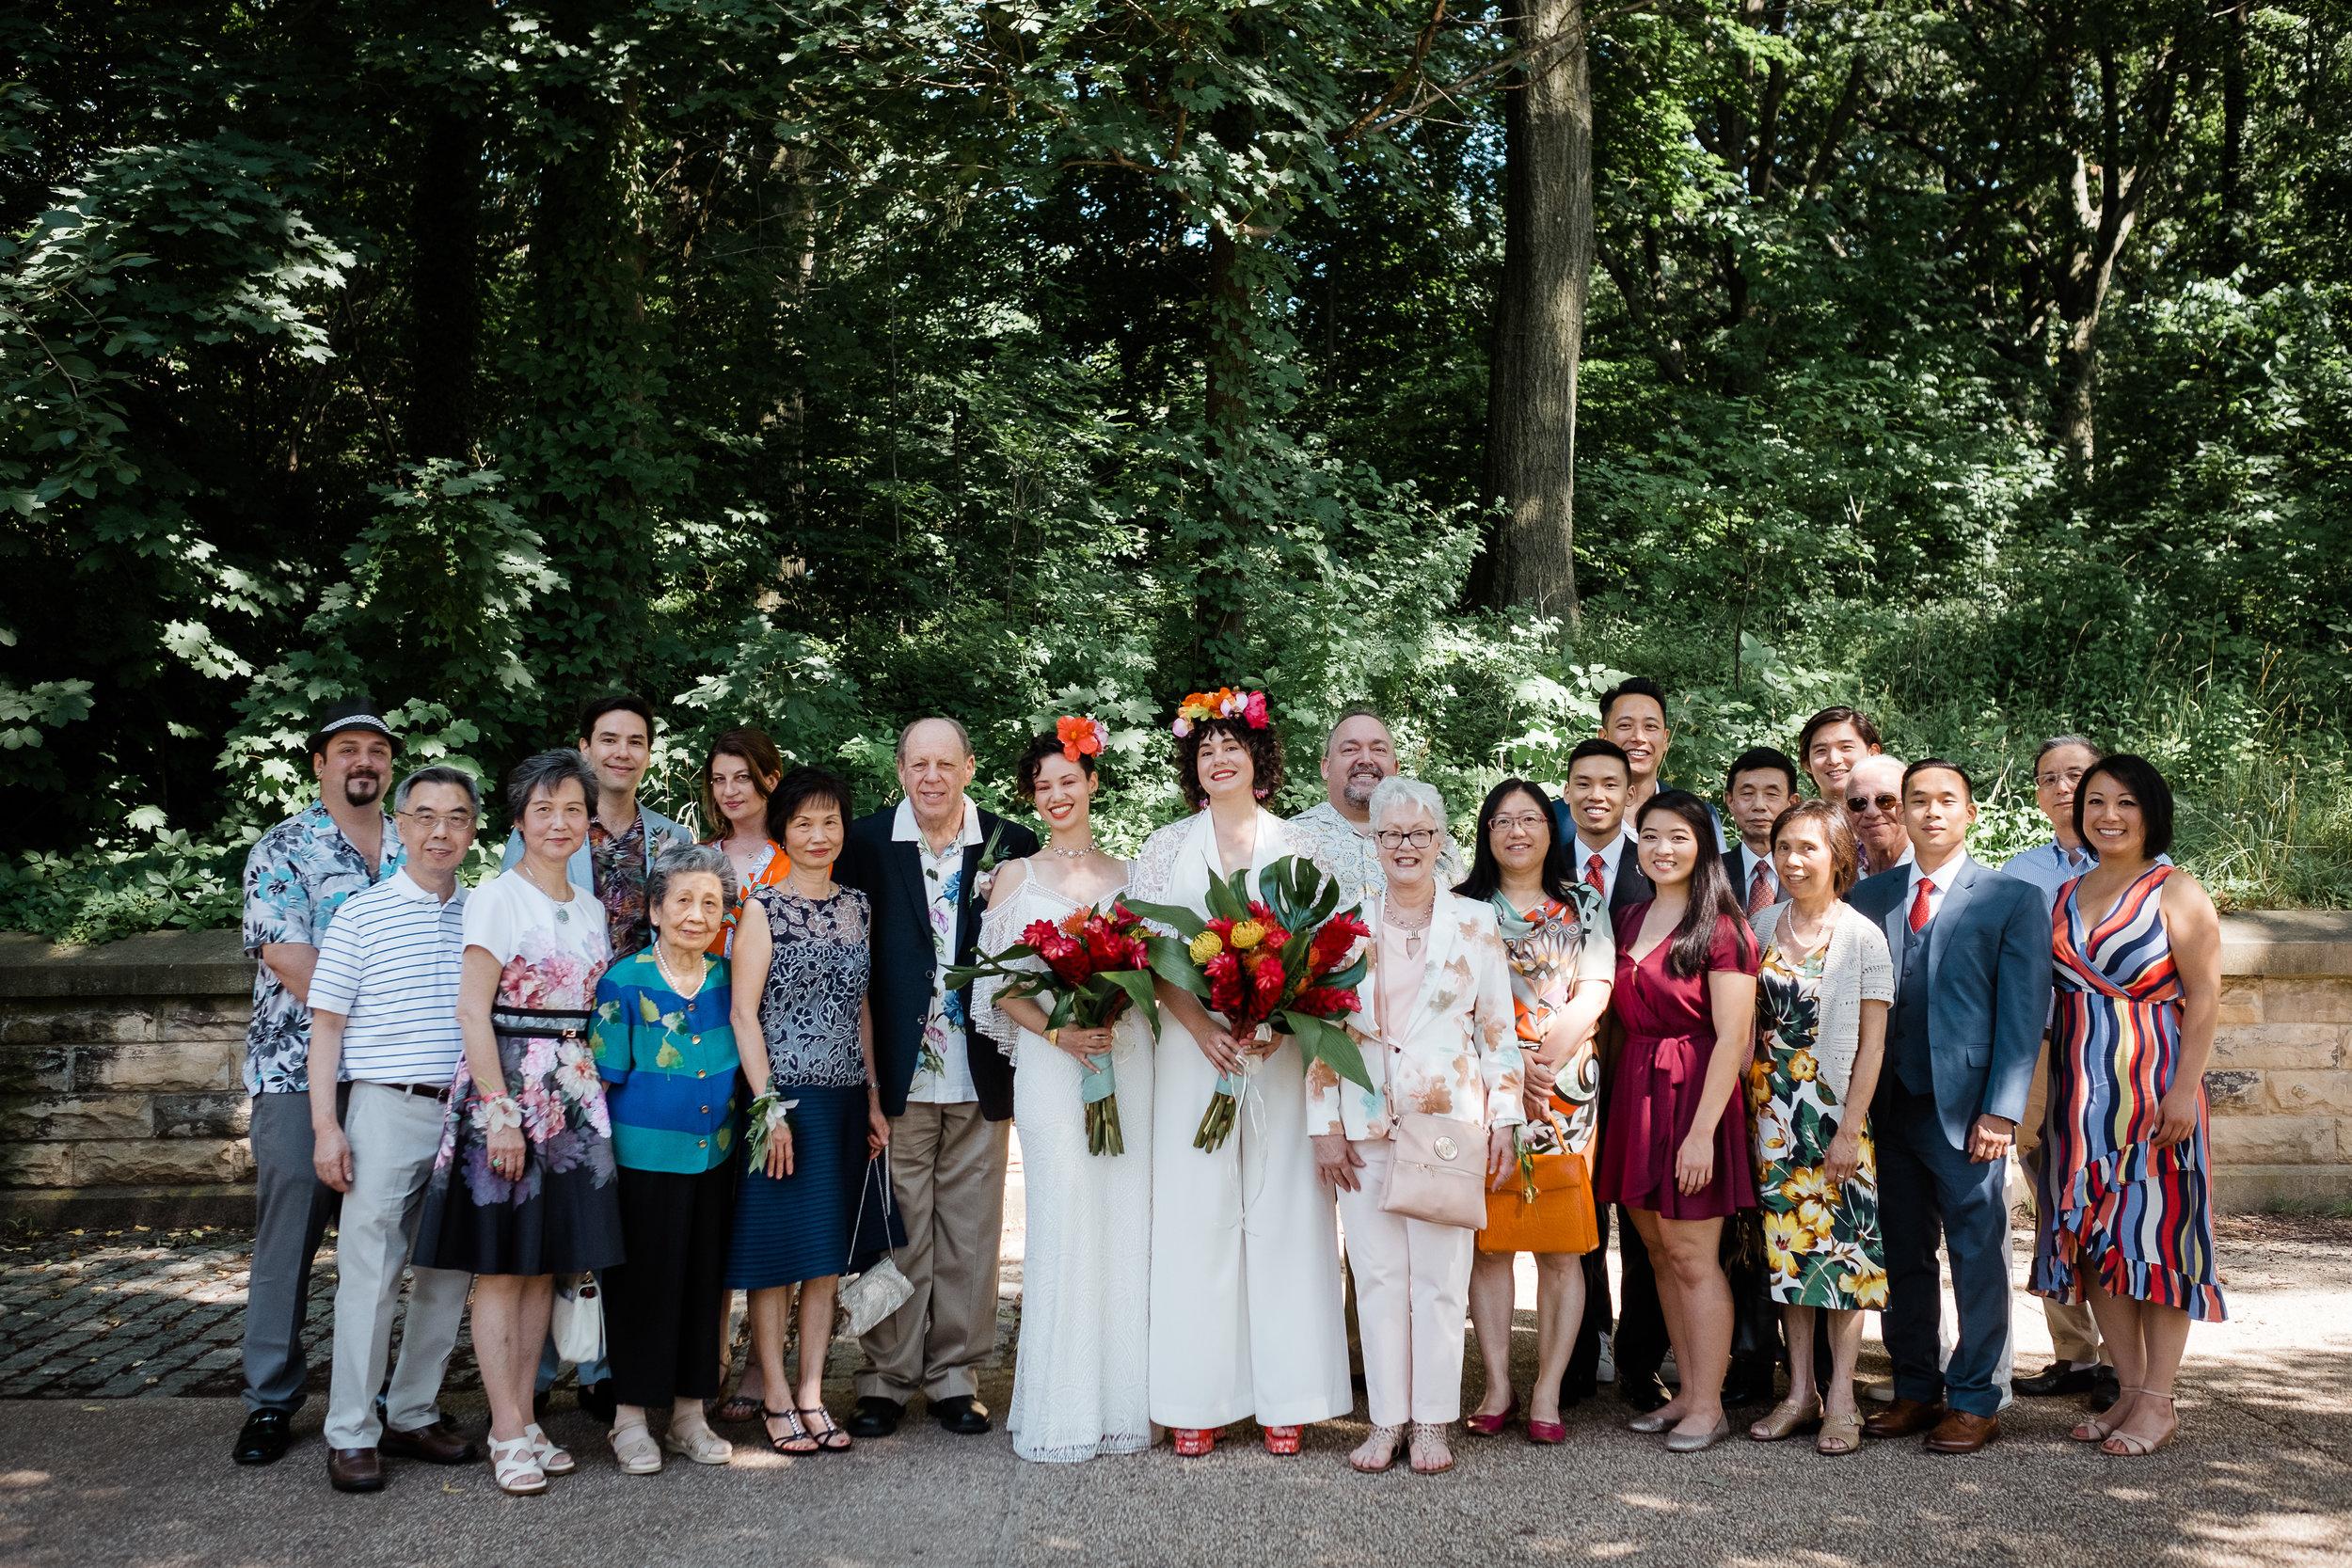 WSPCo-06302018-Doreen-Danielle-Wedding-Sneak-Peek-25.jpg